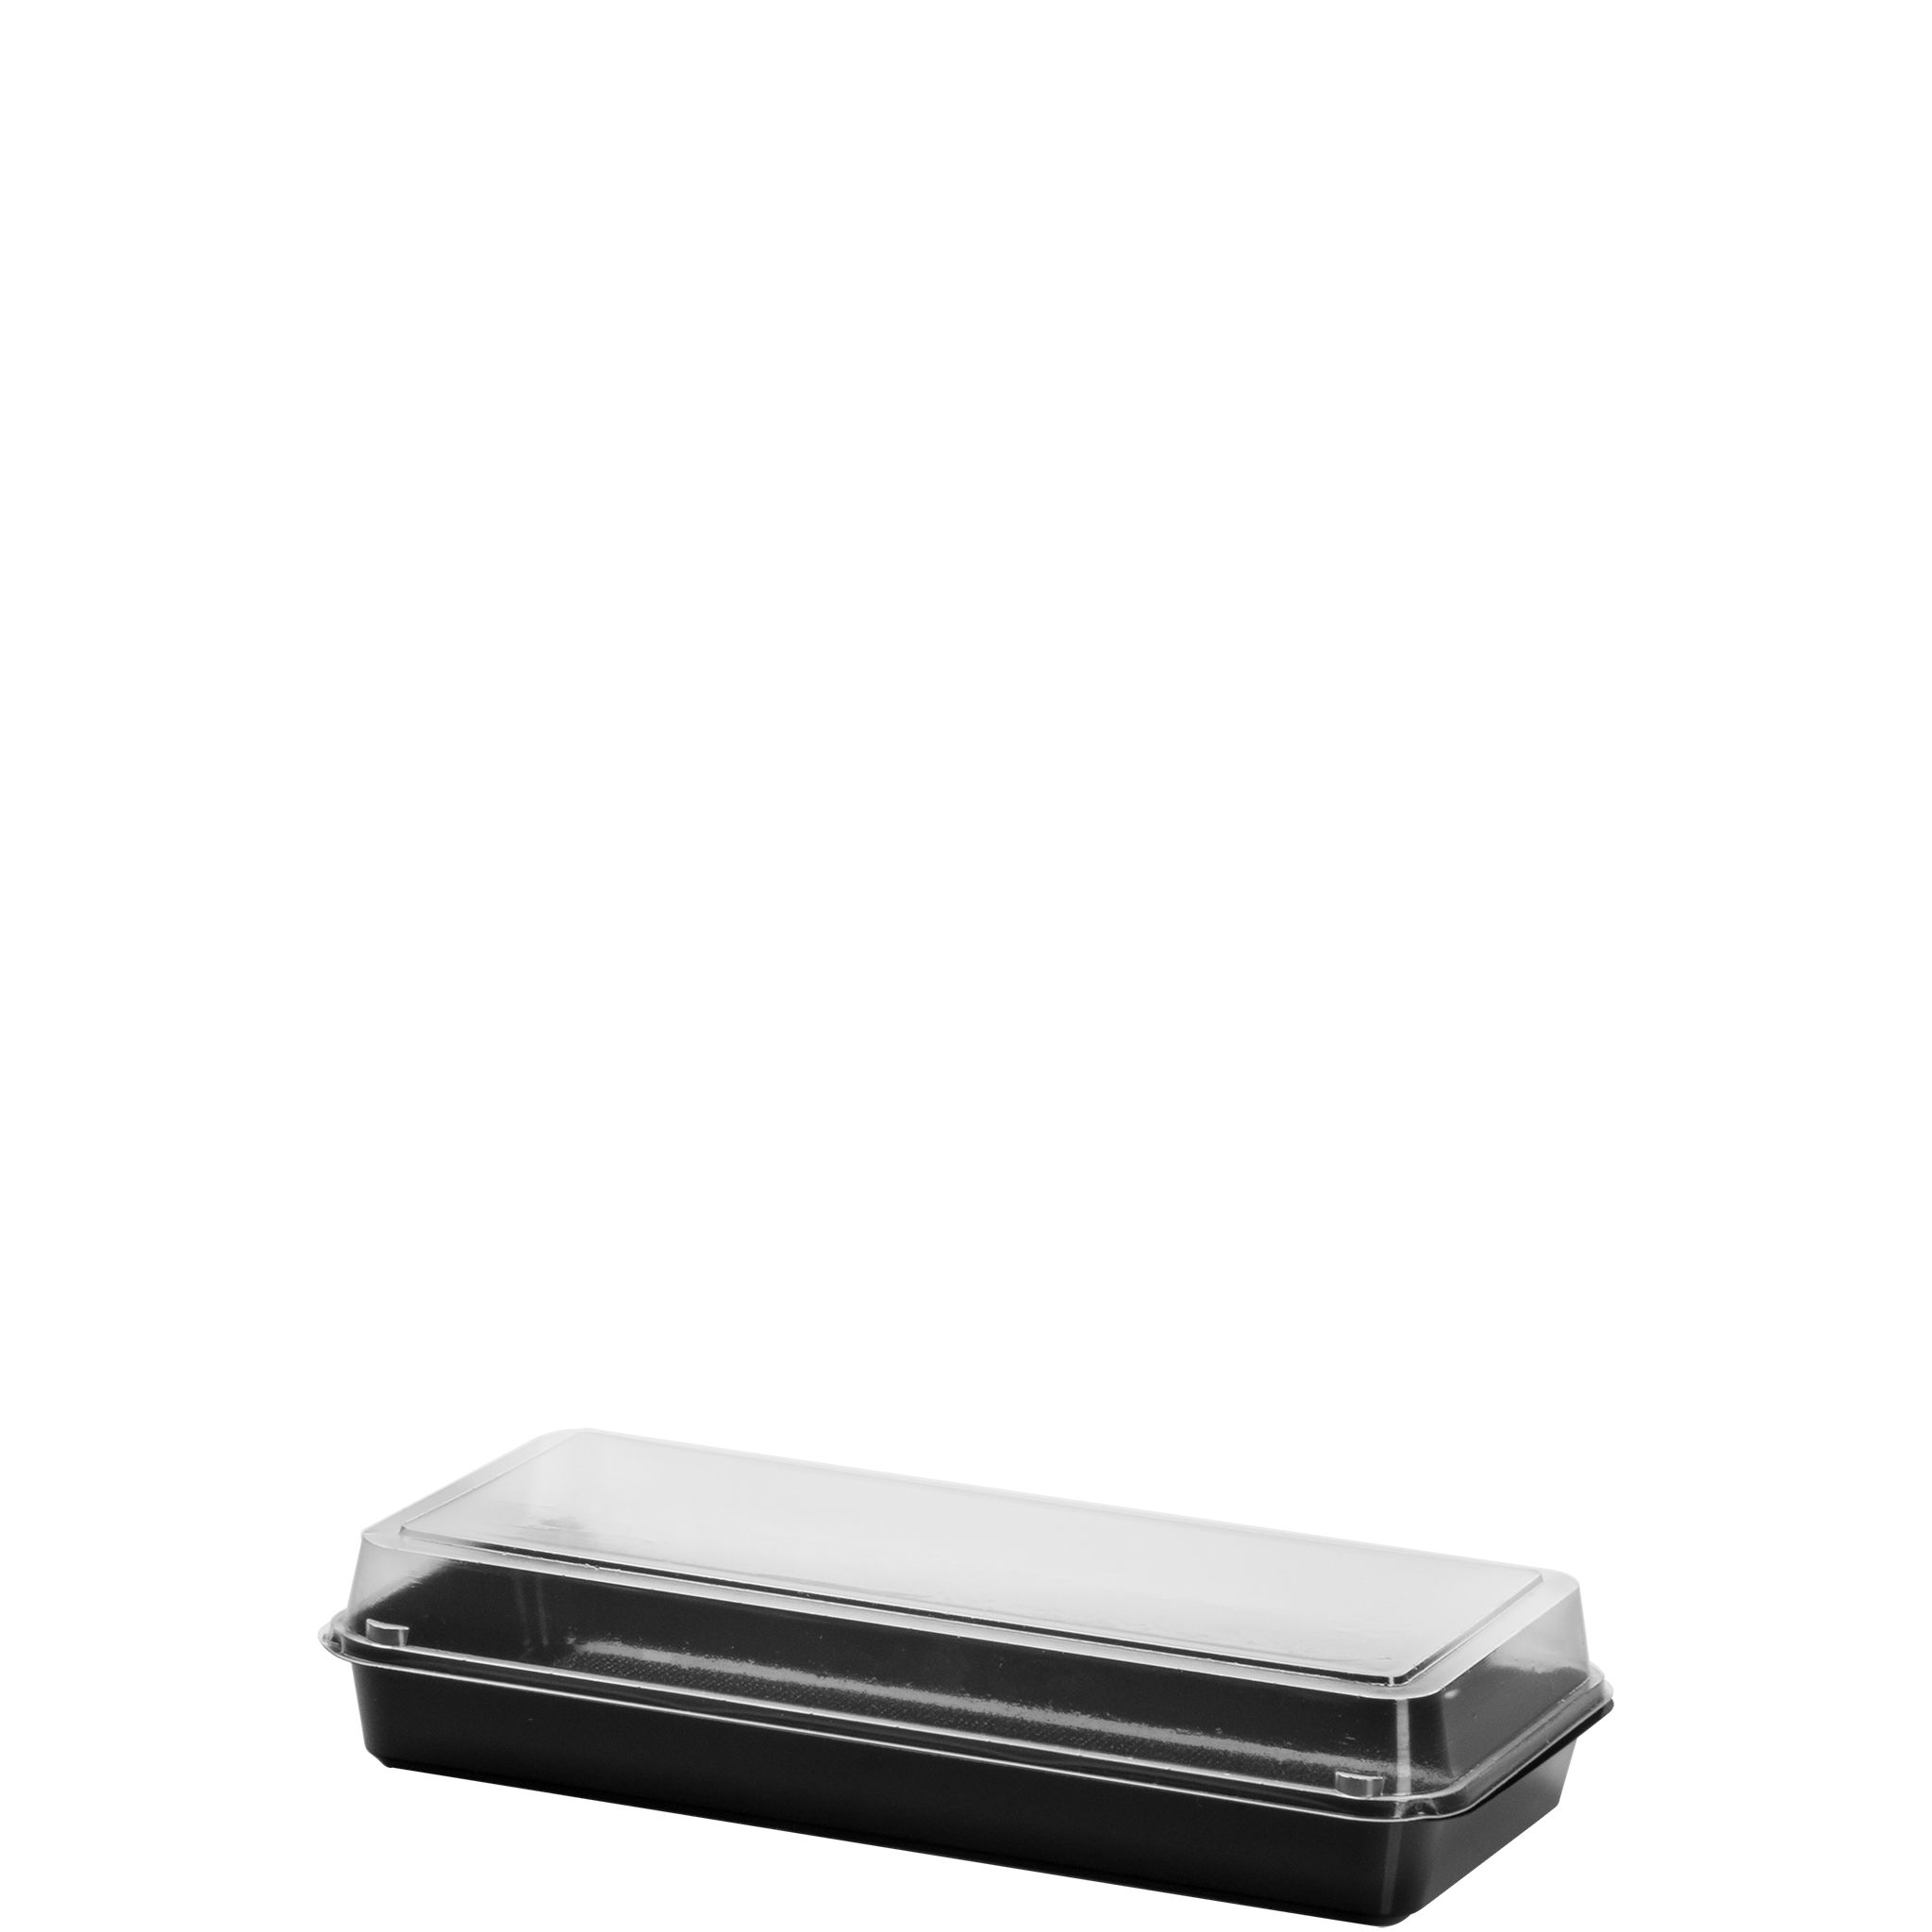 848604-PS94